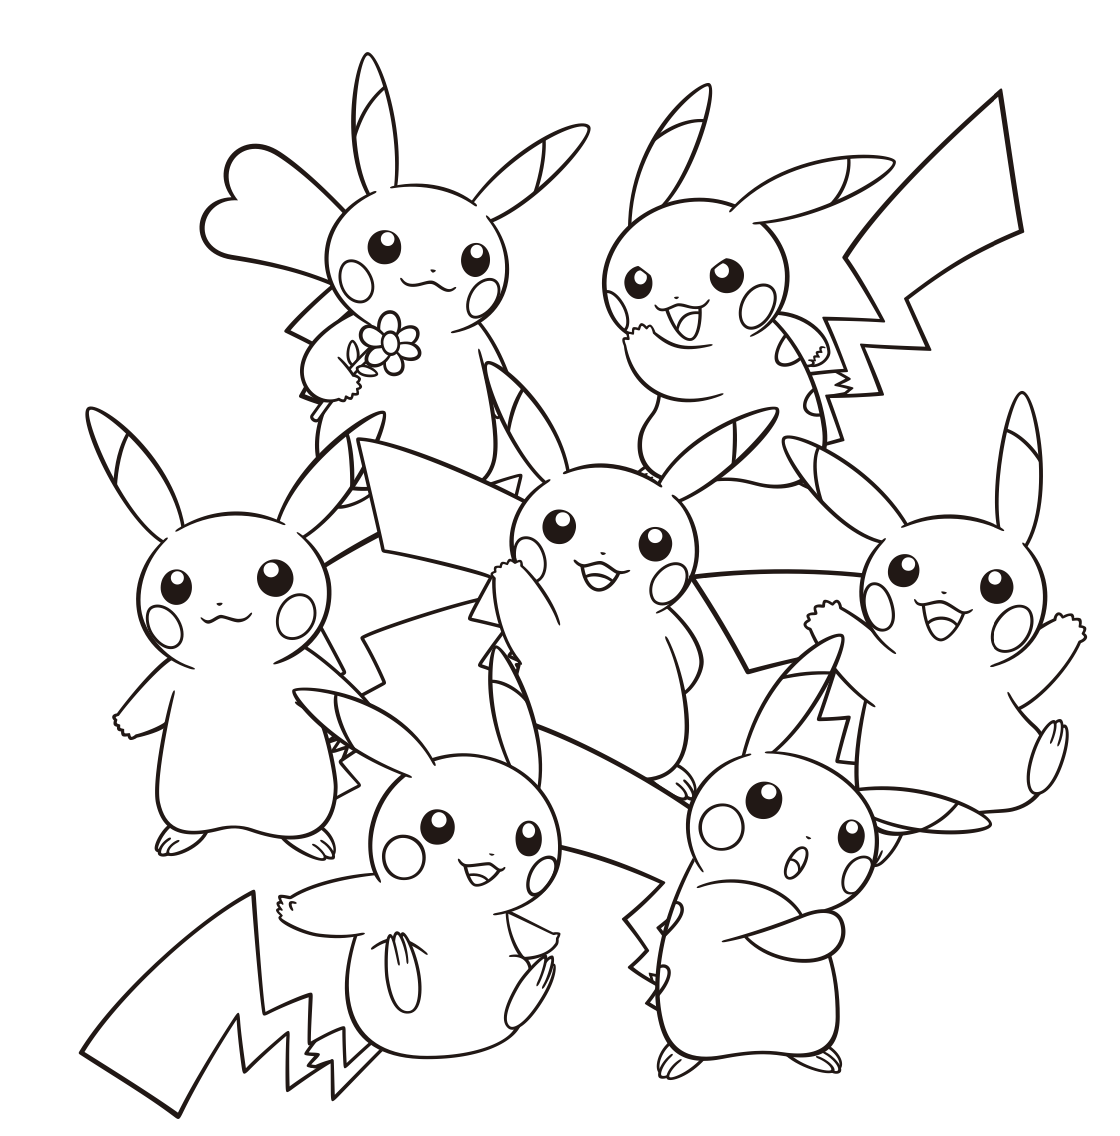 Pokémon: Holt euch offizielle Ausmalbilder - n-Switch-on.de